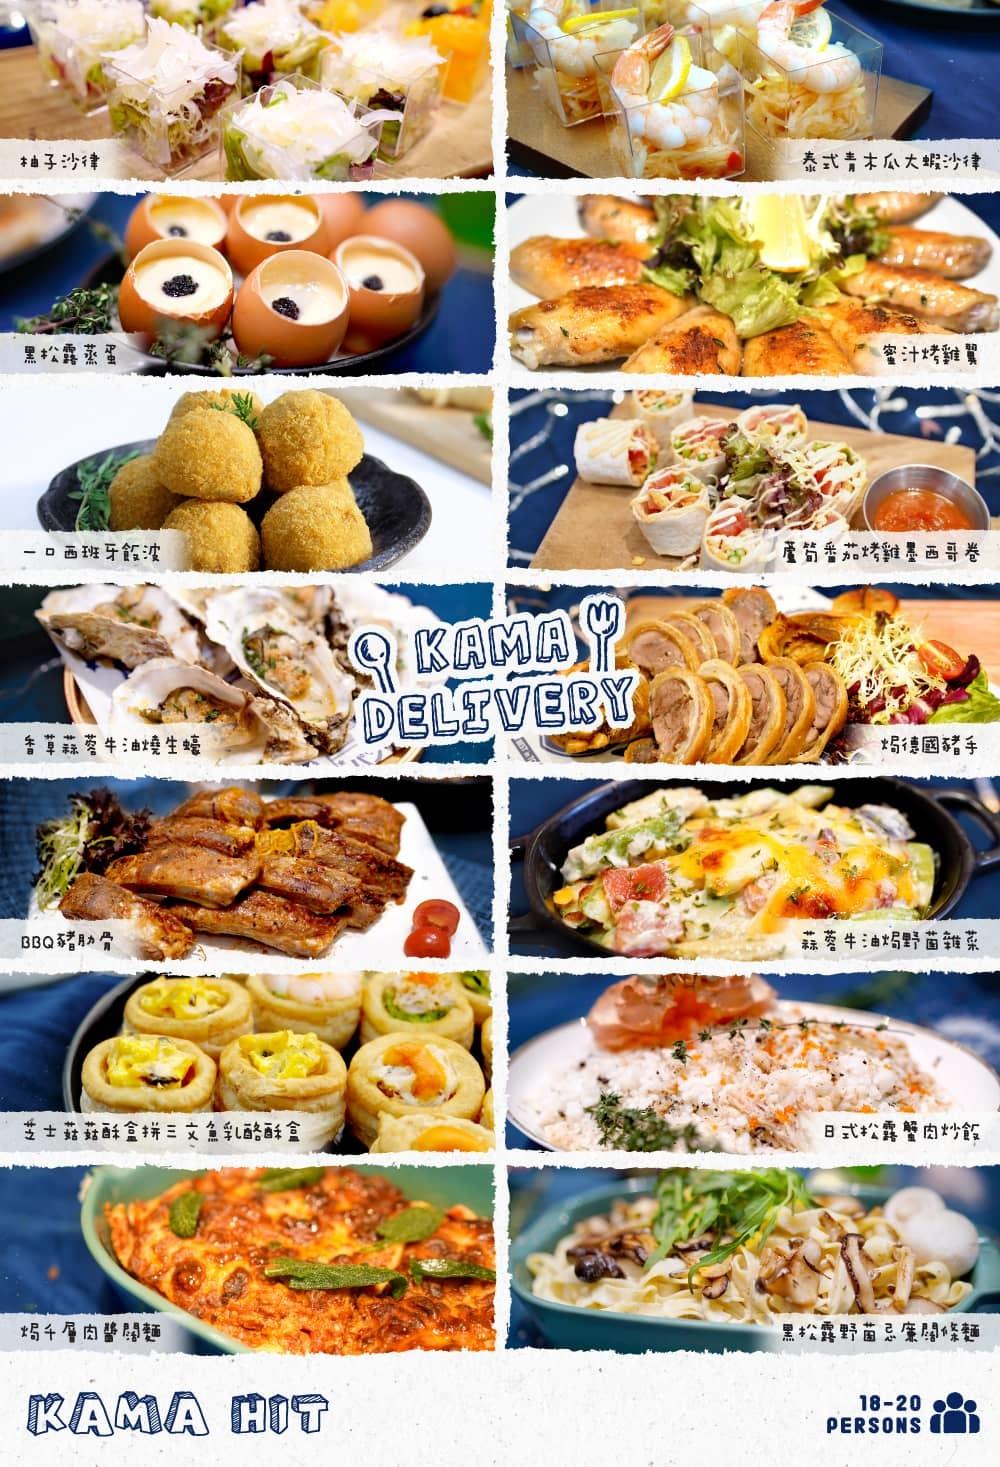 Kama Delivery推出的Kama Hit Set到會套餐食物份量適合18-20人到會派對享用|美食到會外賣服務推介